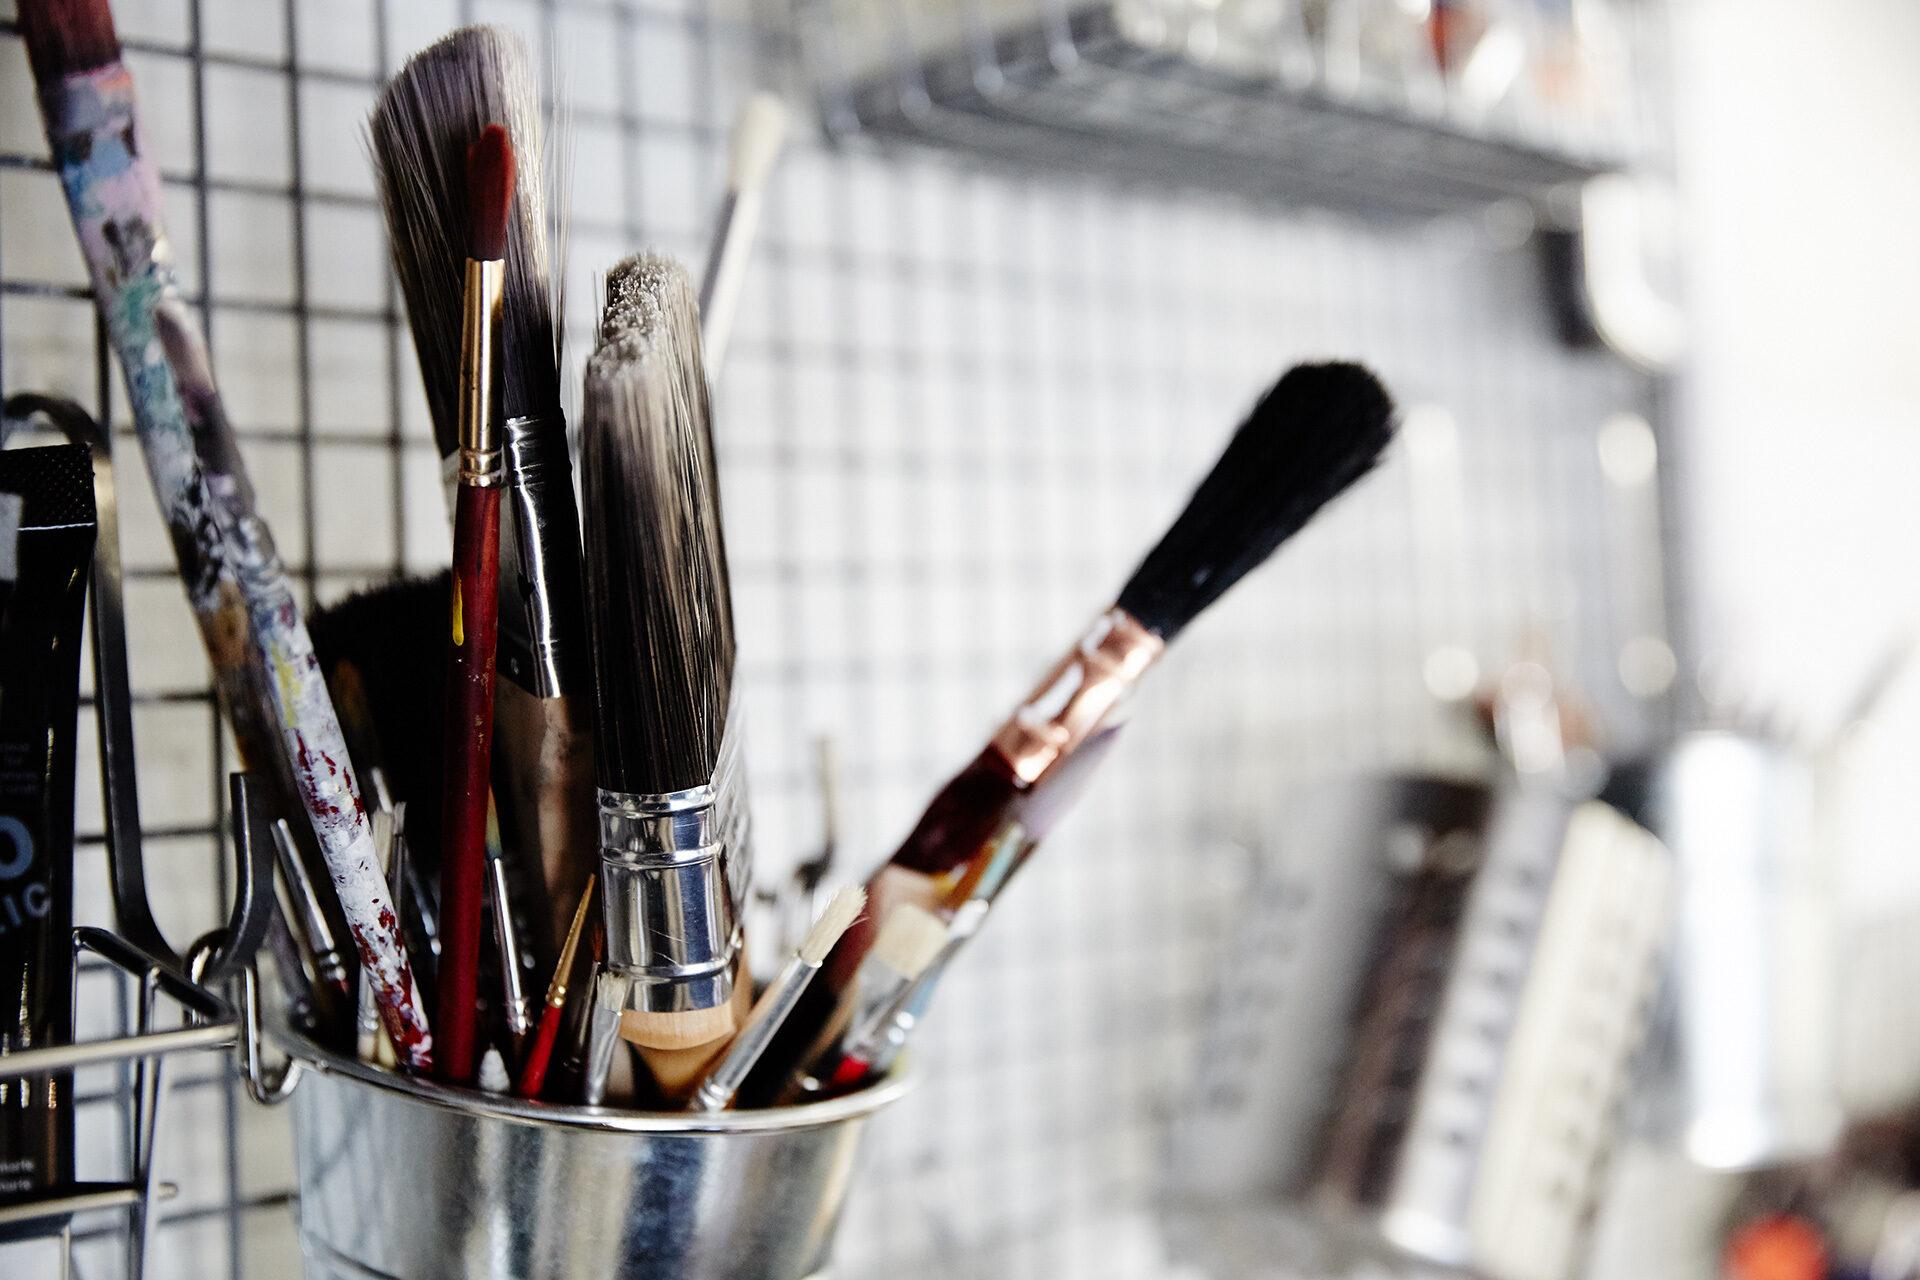 Headjam paint brushes